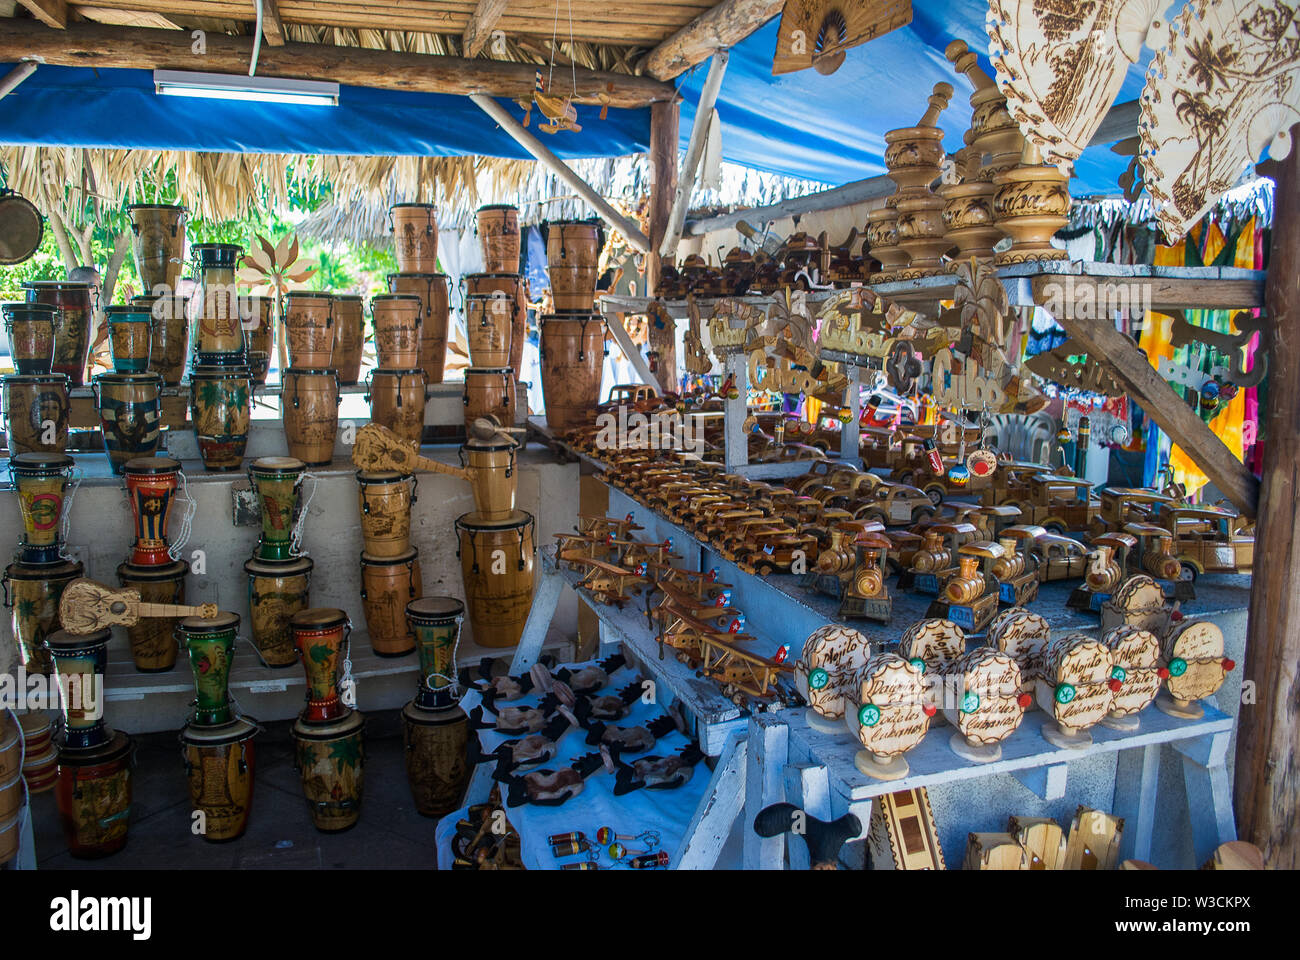 Matanzas, Varadero - Cuba / October 11 2011, Stall with beautiful wooden handmade souvenirs from Cuba - Stock Image